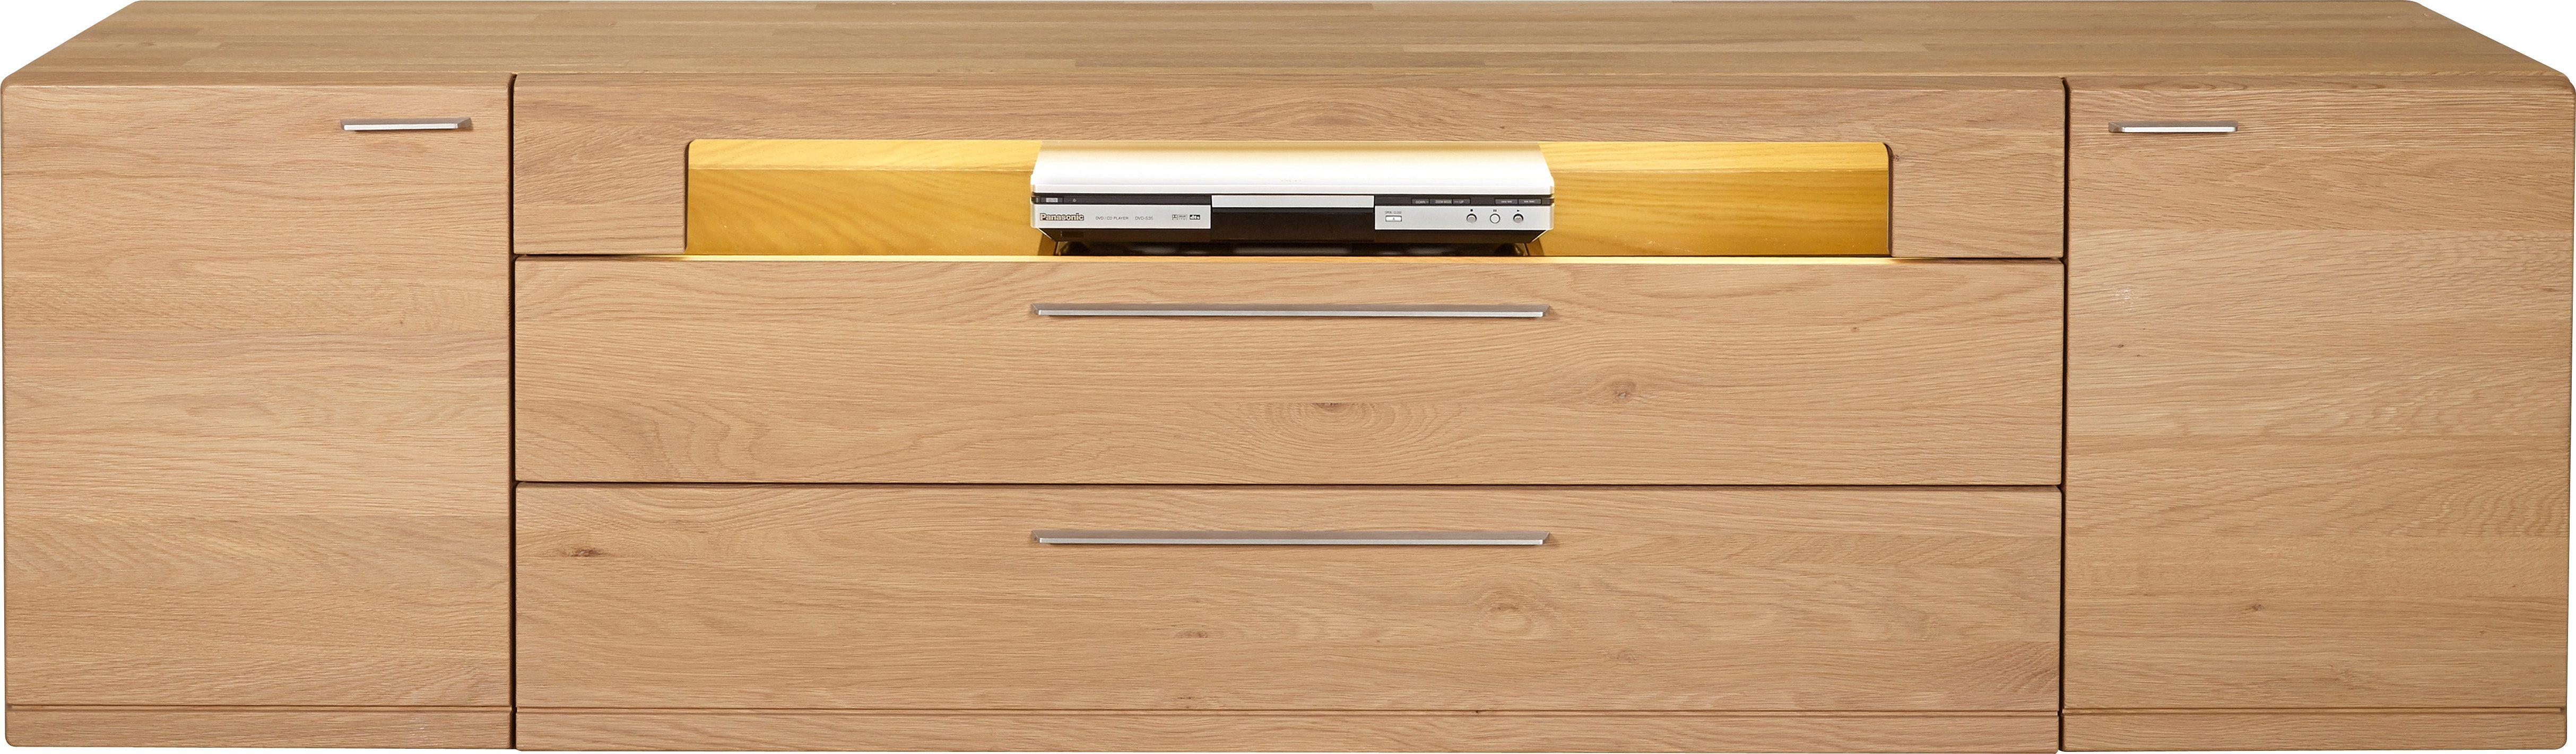 HARTMANN Lowboard »Viva«, Breite 210 cm